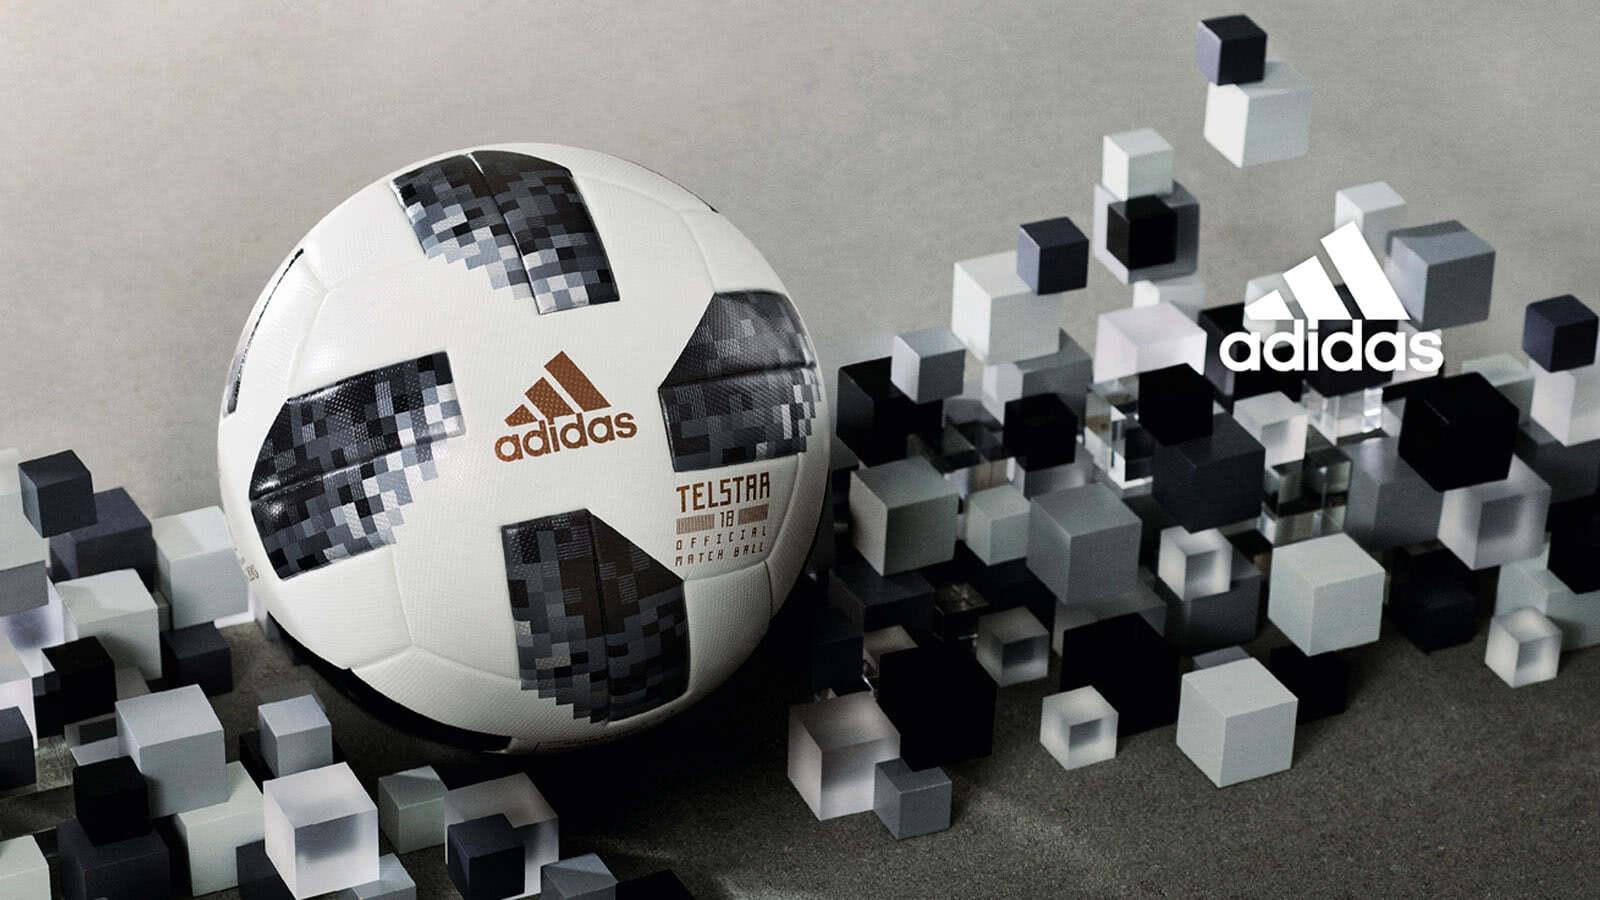 jetzt jeden adidas telstar 18 WM Ball reduziert bestellen!